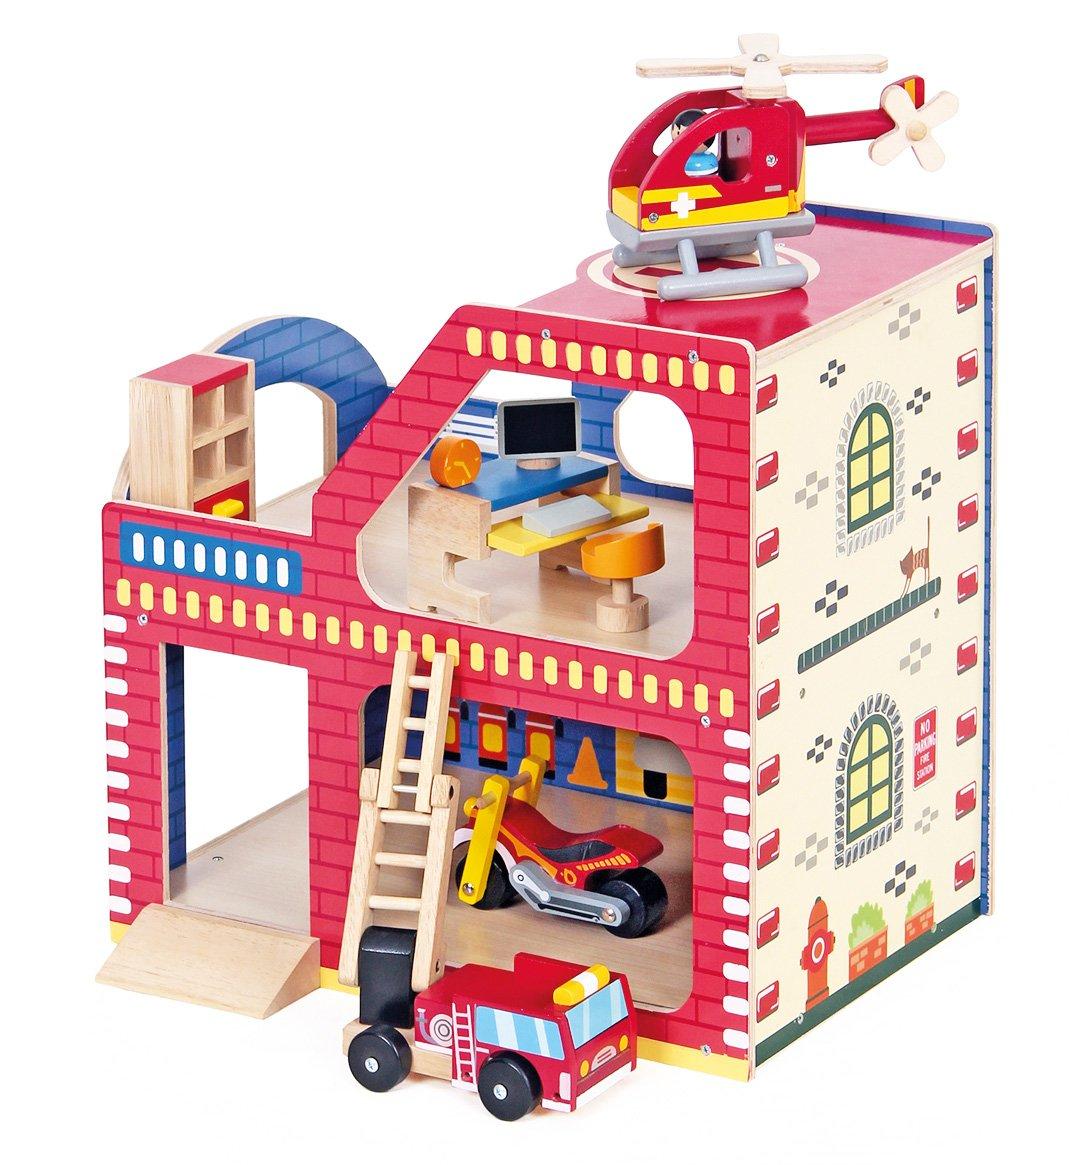 Feuerwehrstation Holz - Mentari Feuerwehrstation aus Holz